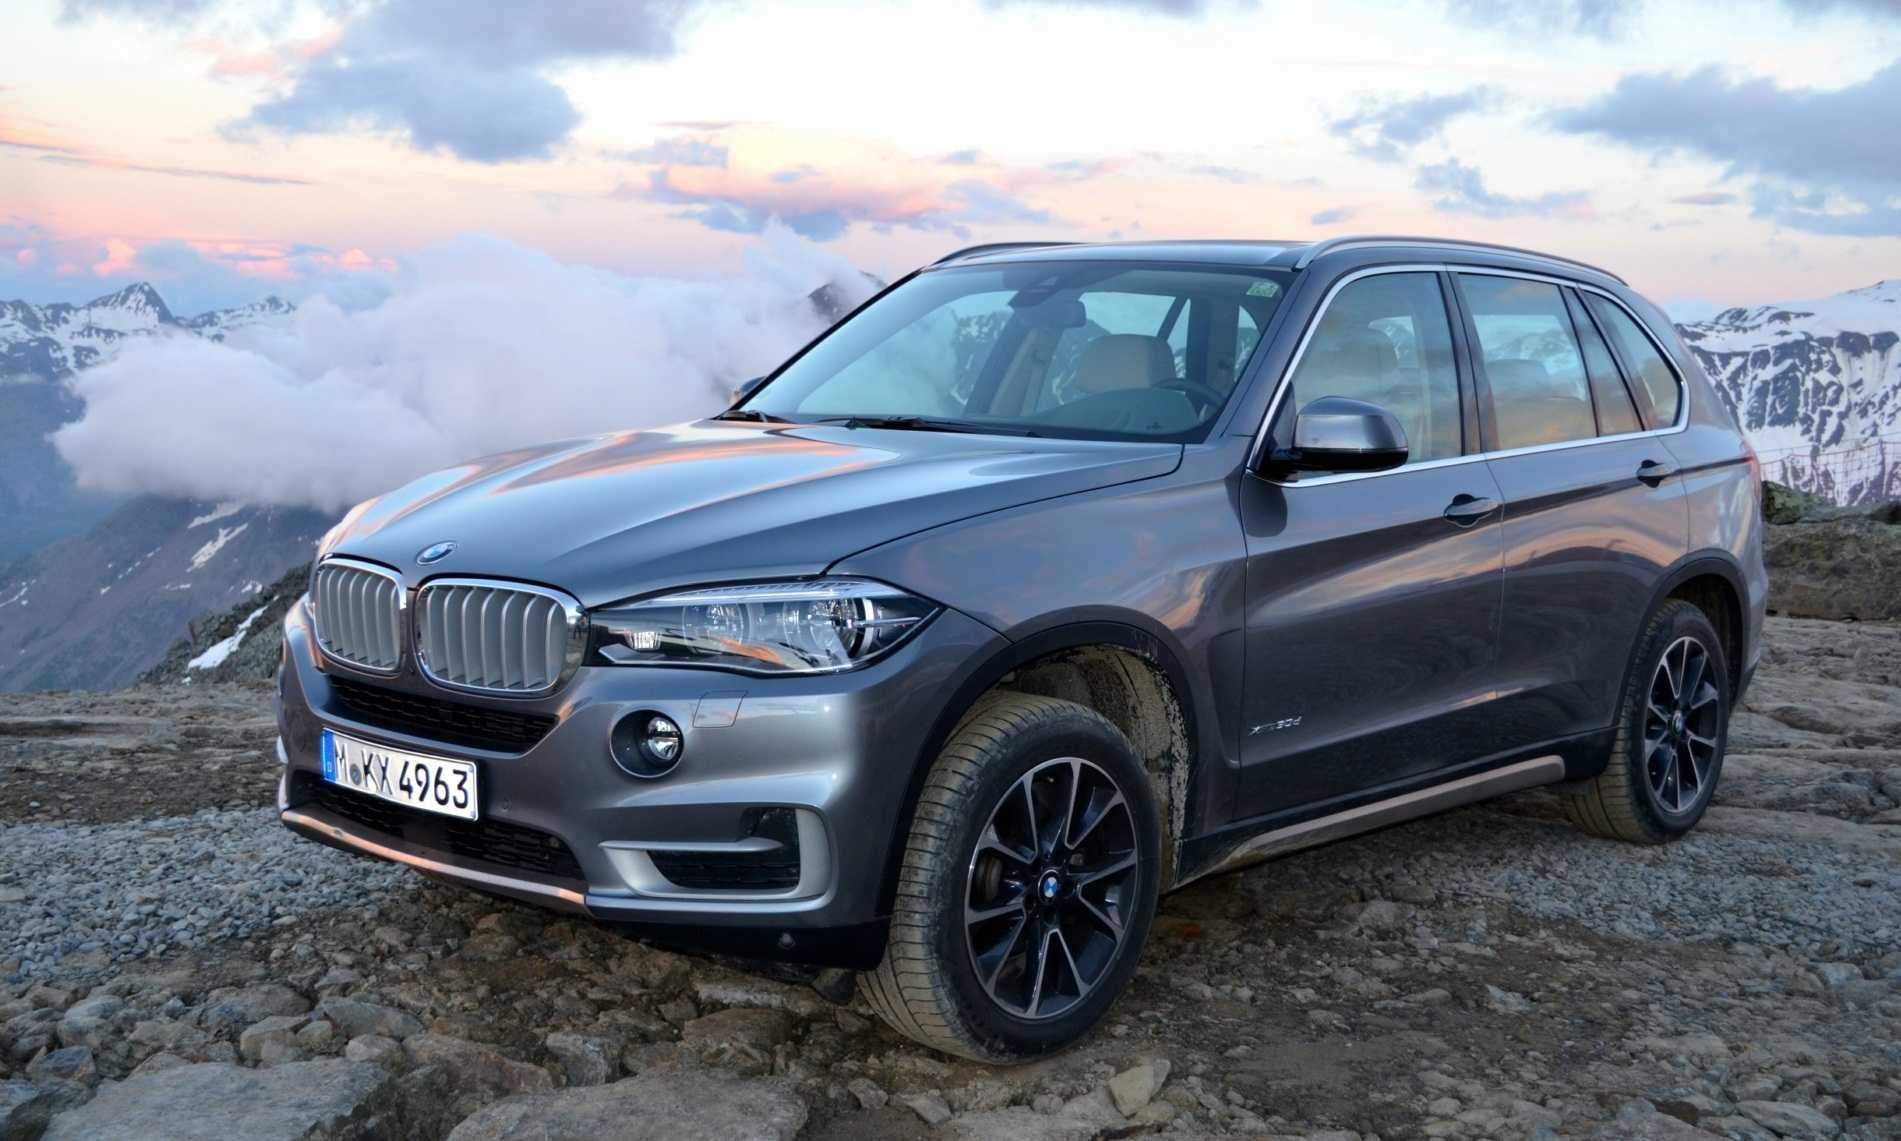 Технические характеристики БМВ Х5 2021 / BMW X5 (G05)